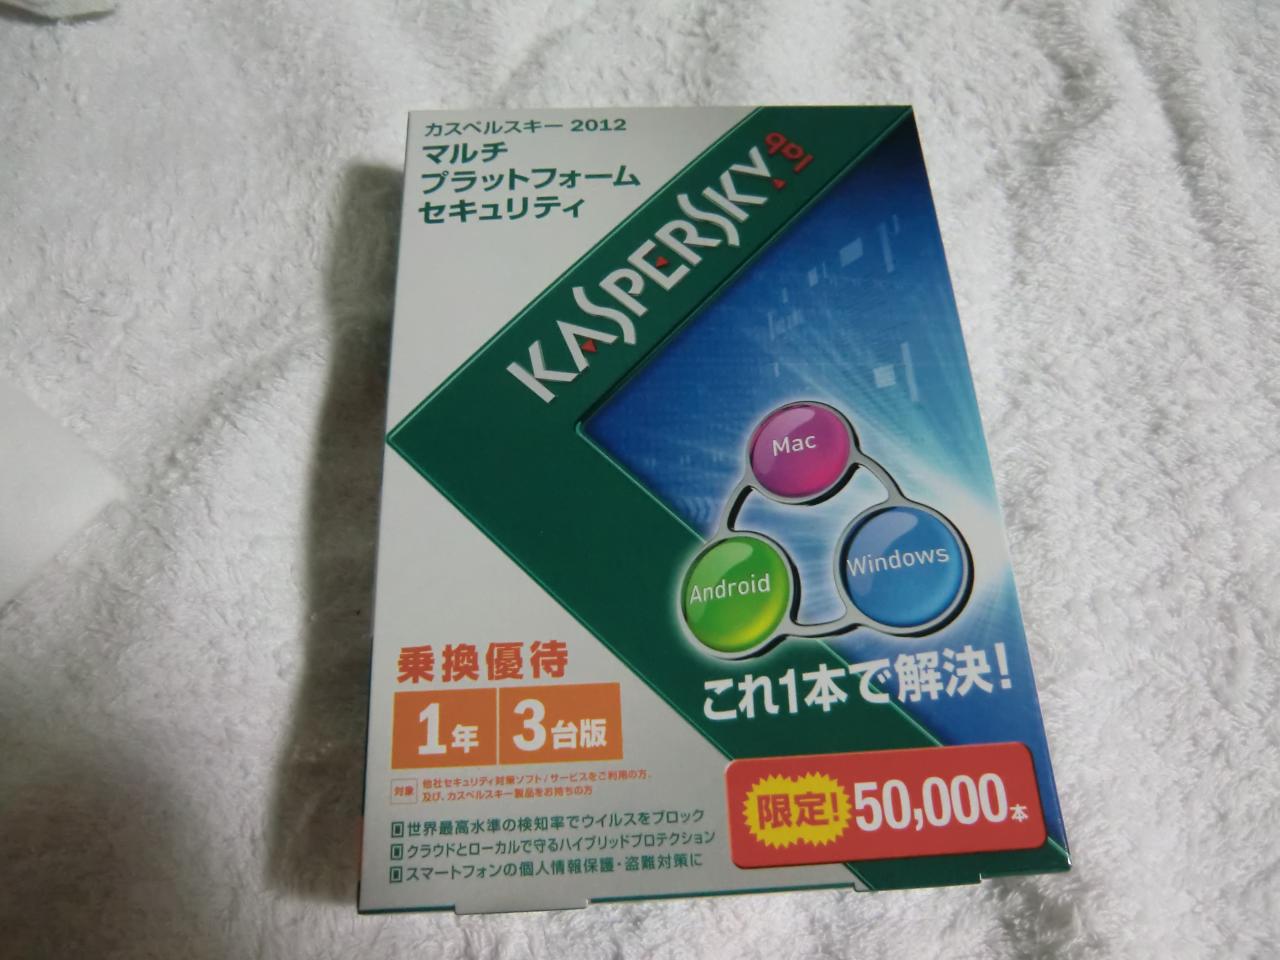 kaspersky2012